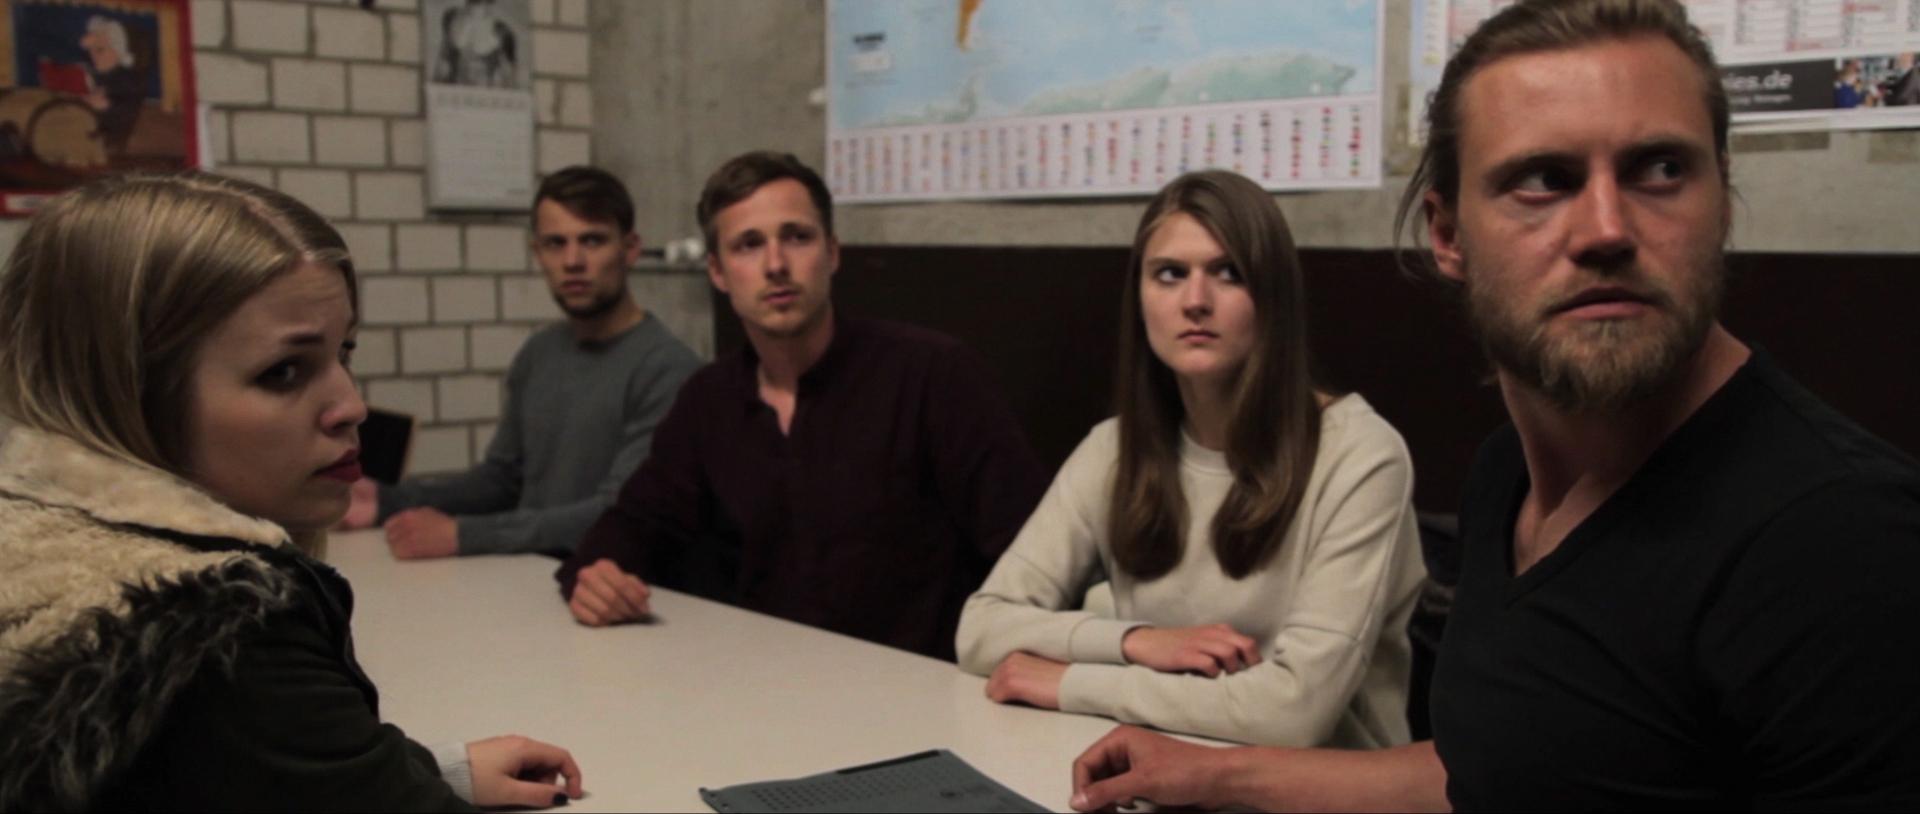 Sarah Mevers (Betti), Christopher Comouth (Lars), Alexander Benedikt Schulz (Basti), Bettina Hammelrath (Amy) und Oleksii Okhotiuk (Mark) schmieden gemeinsam einen Plan. Foto: I Mann Studios